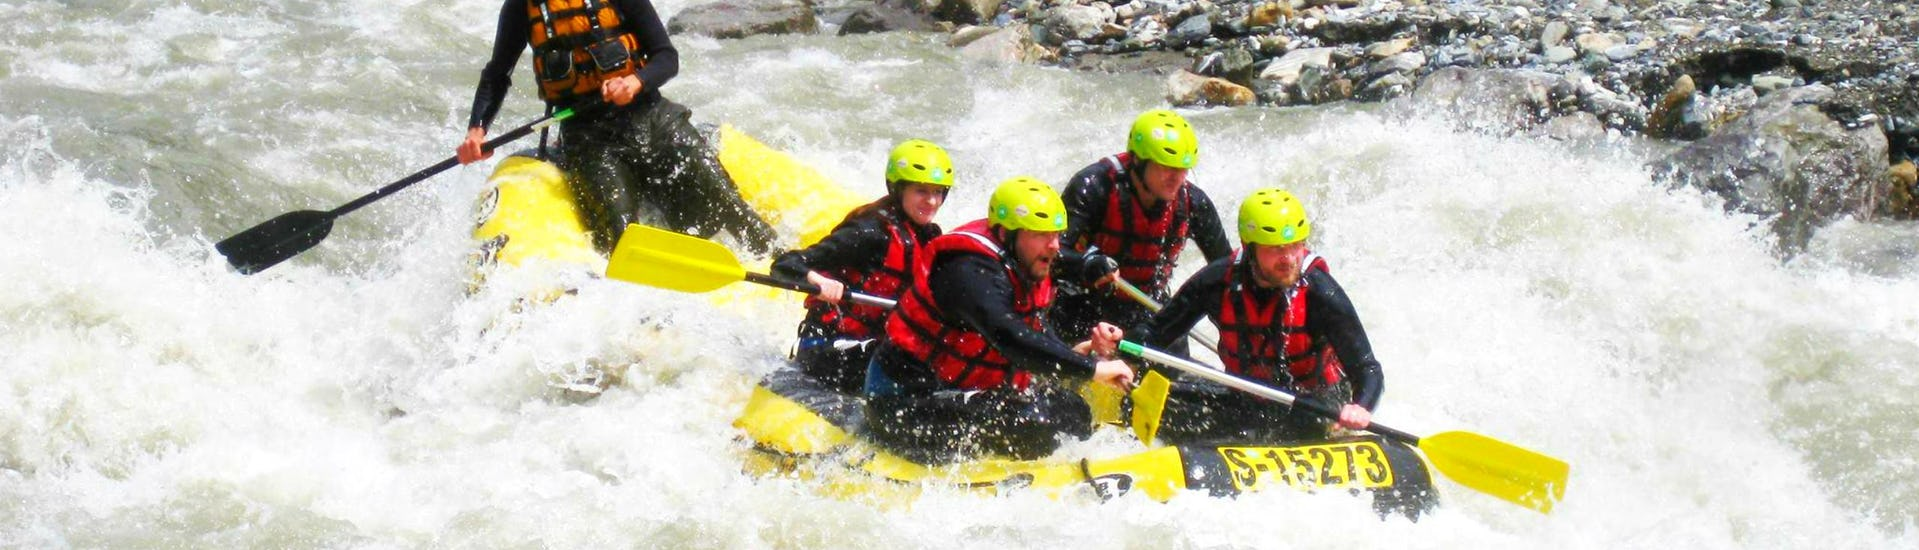 rafting-for-adventurers-salzach-frost-hero